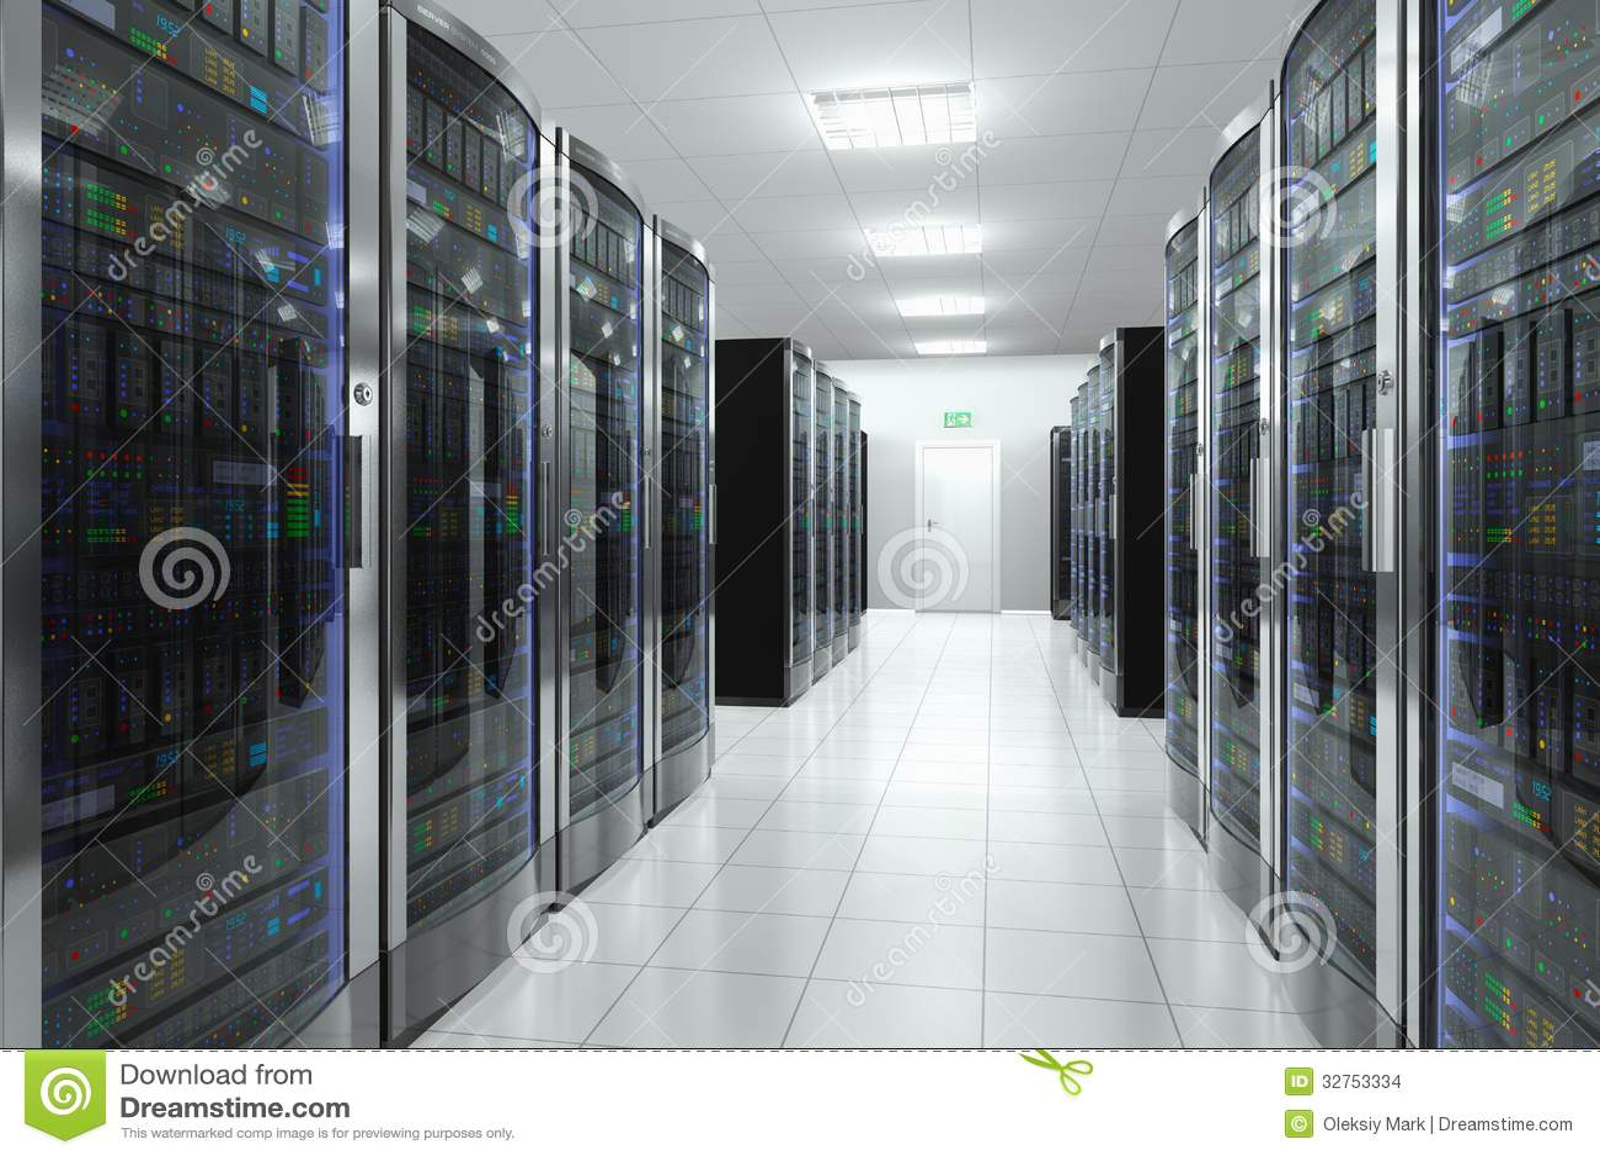 Unlimited Data Plans >> Server room in datacenter stock illustration. Illustration of computer - 32753334